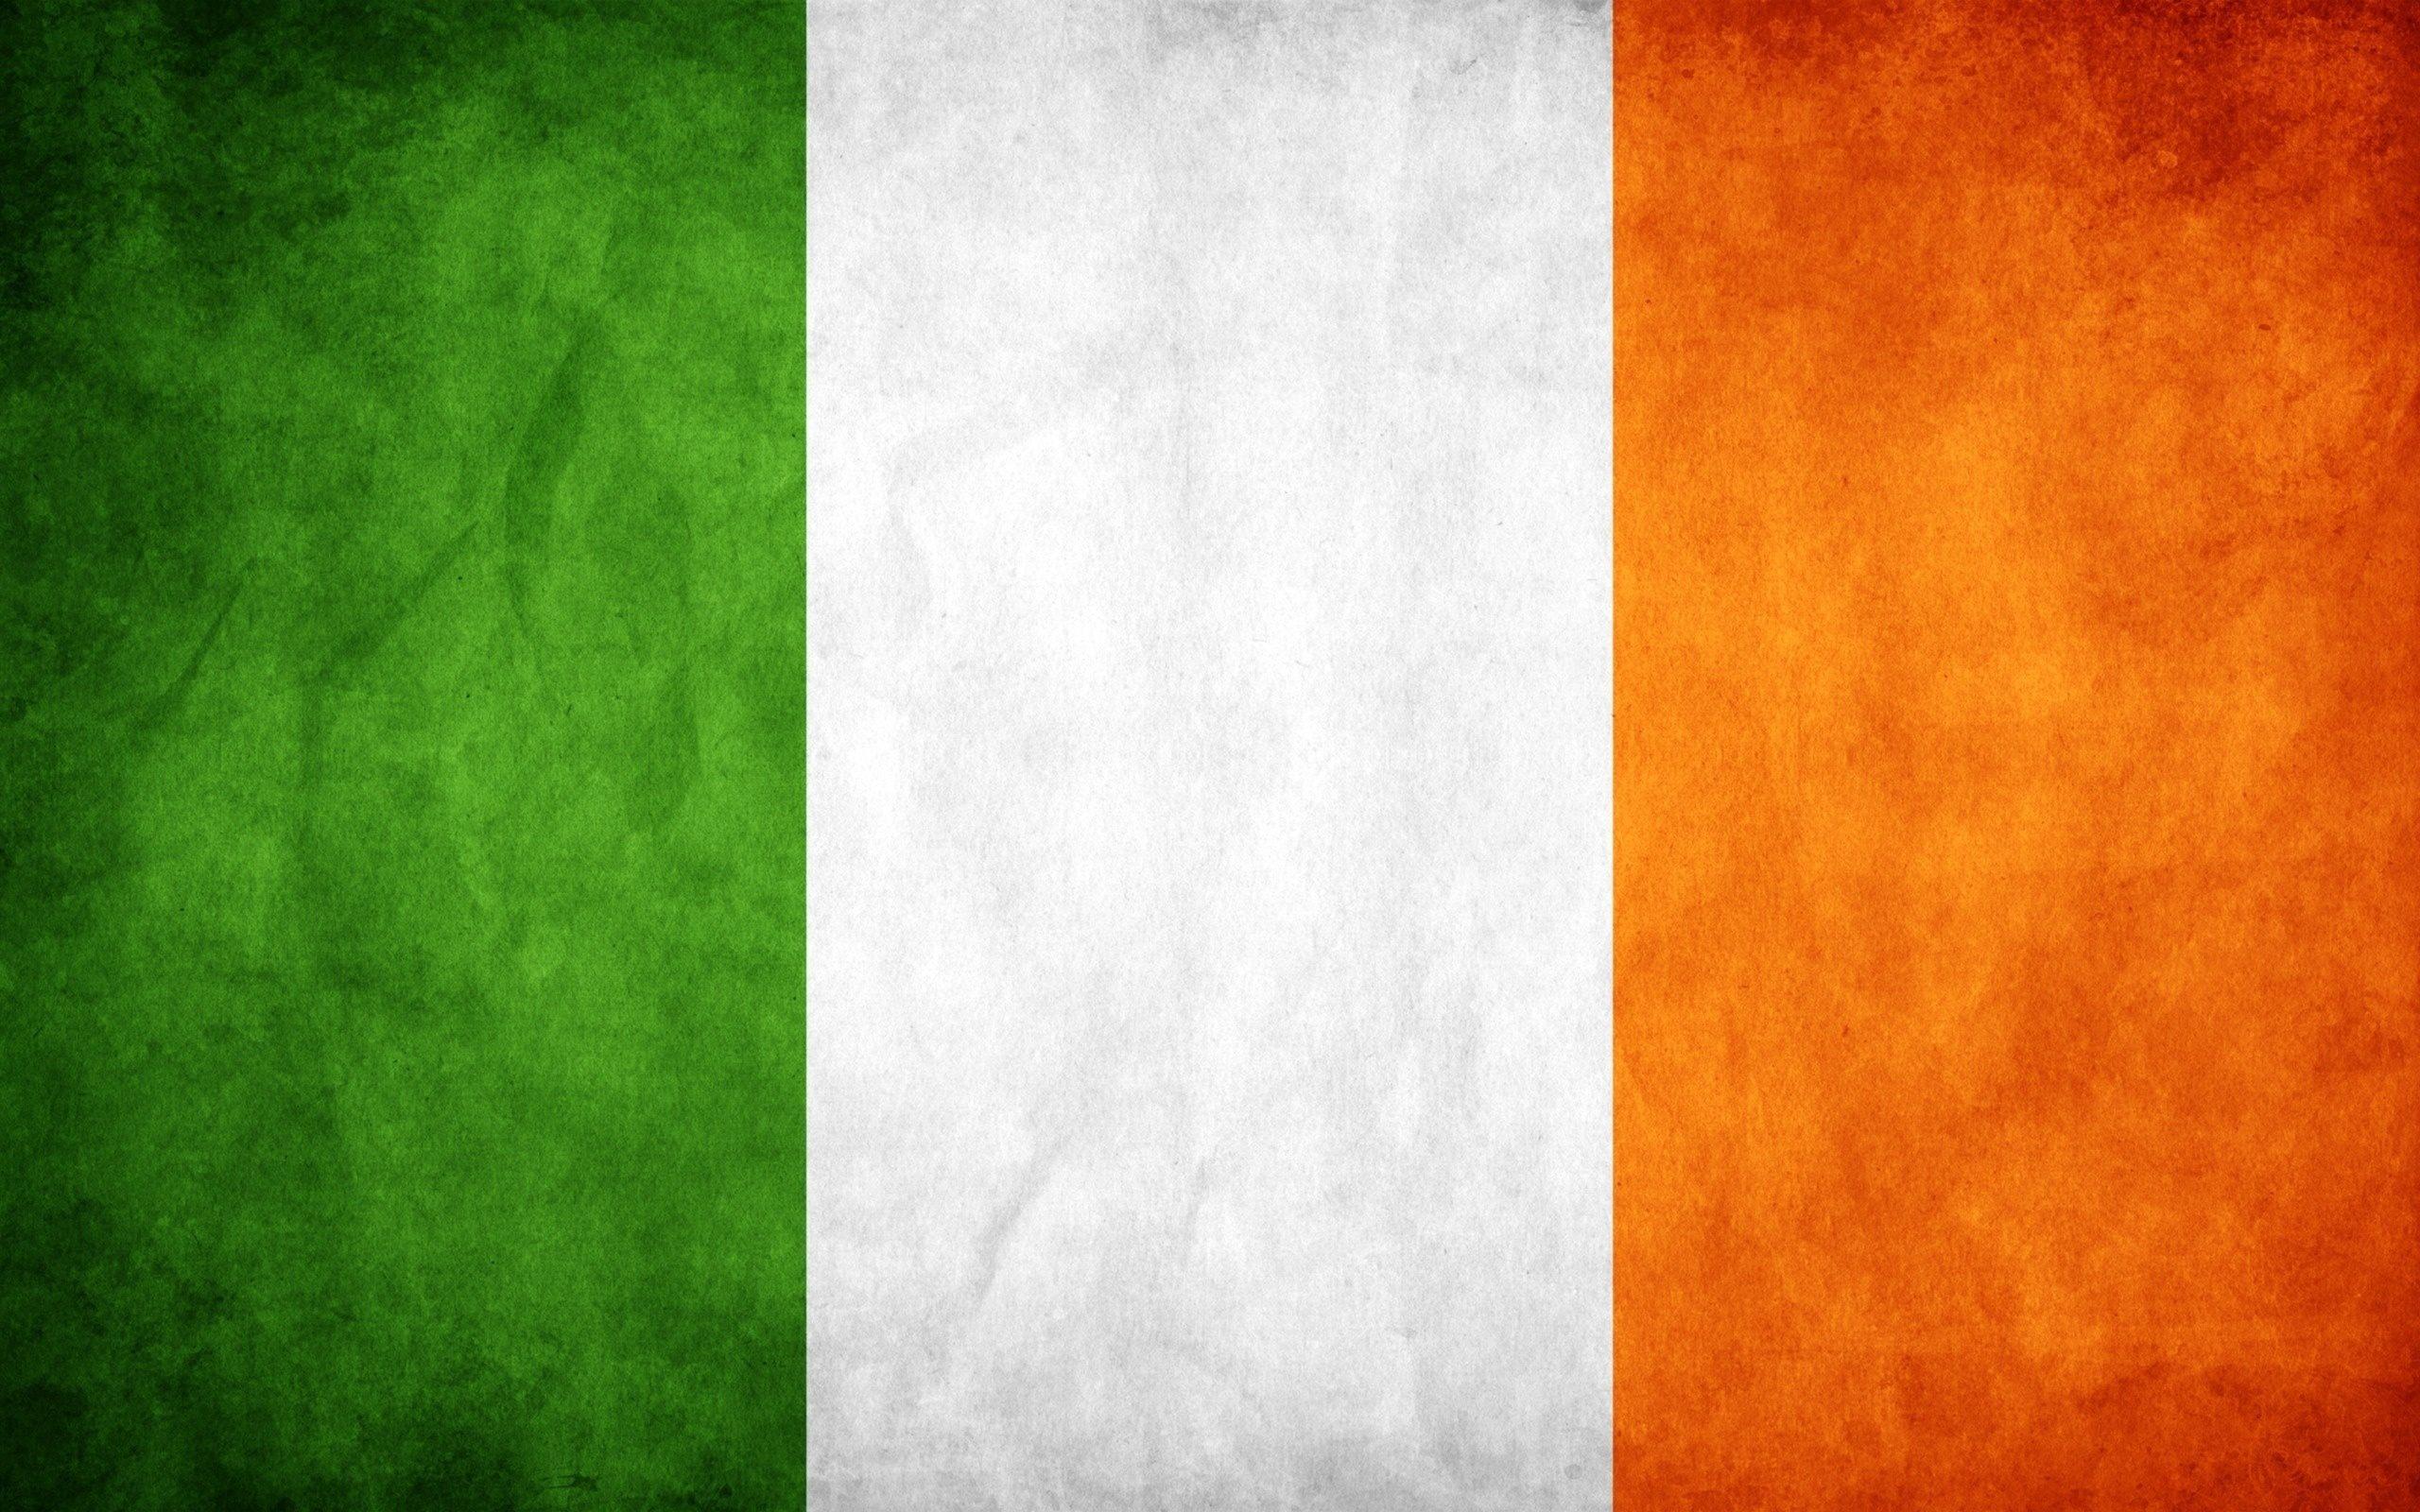 grunge-flag-ireland1